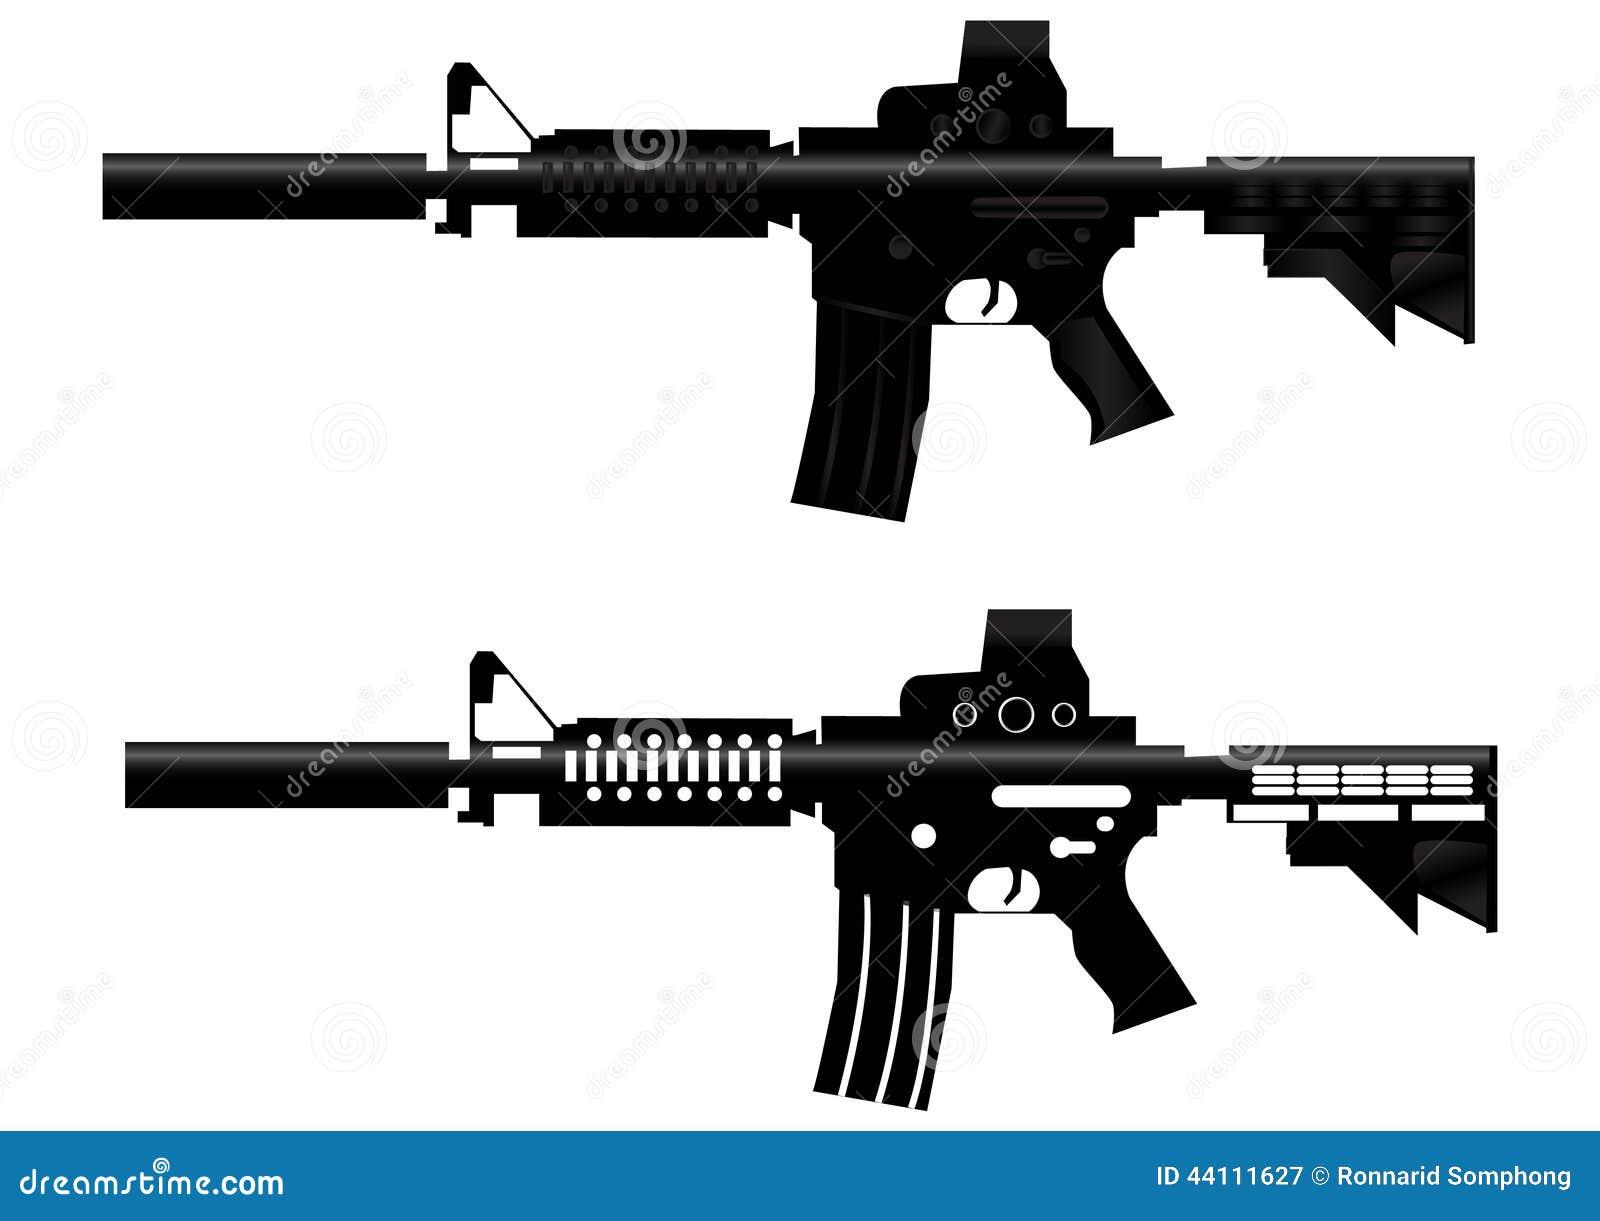 assault rifle gun vector stock vector. illustration of firearms - 44111627  dreamstime.com